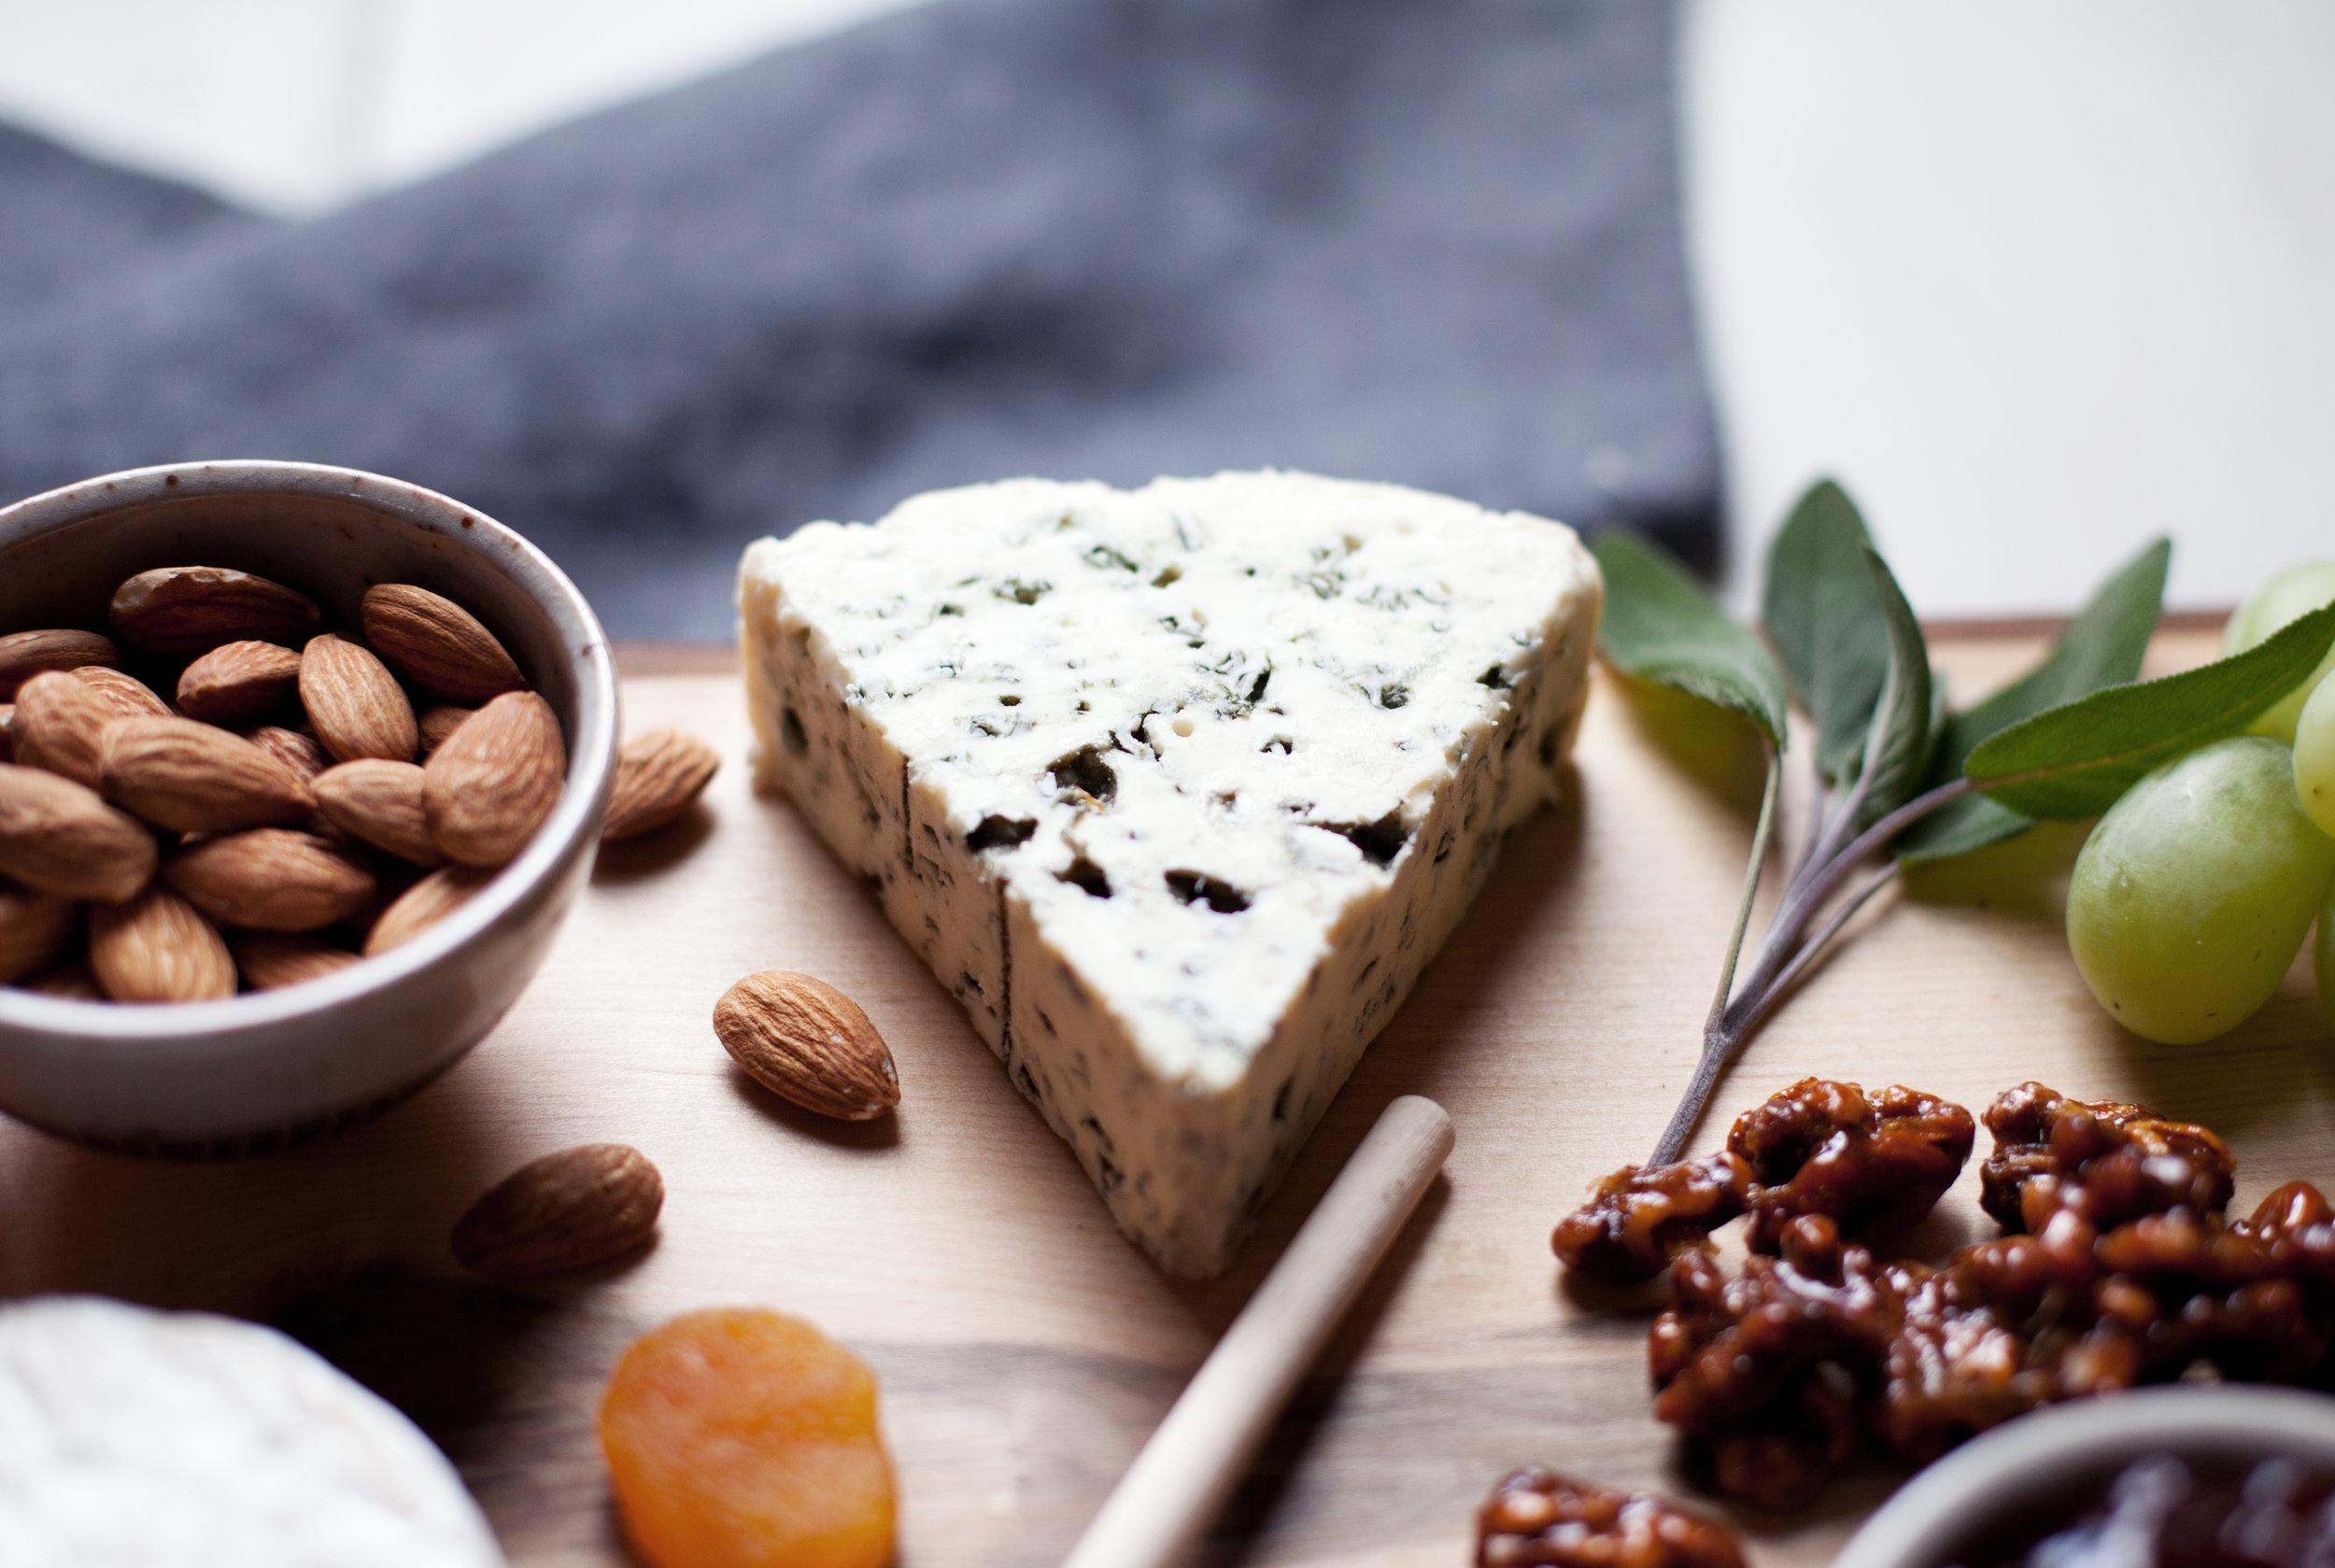 castello sweet cheese board vii.jpg